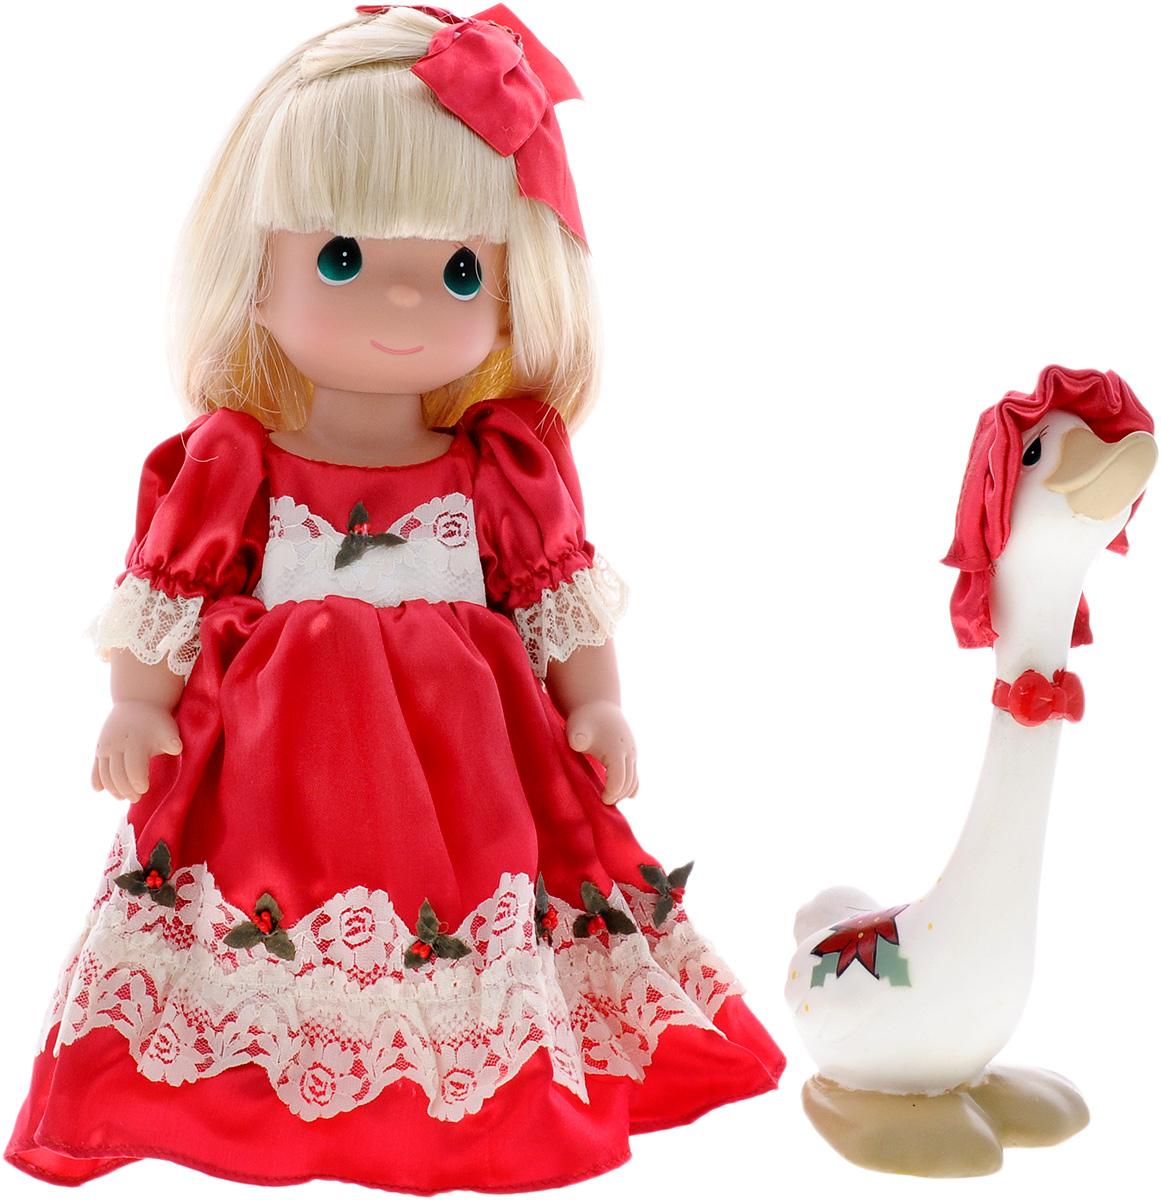 Precious Moments Кукла Рождество куклы и одежда для кукол precious кукла пастушка в розовом 14 см